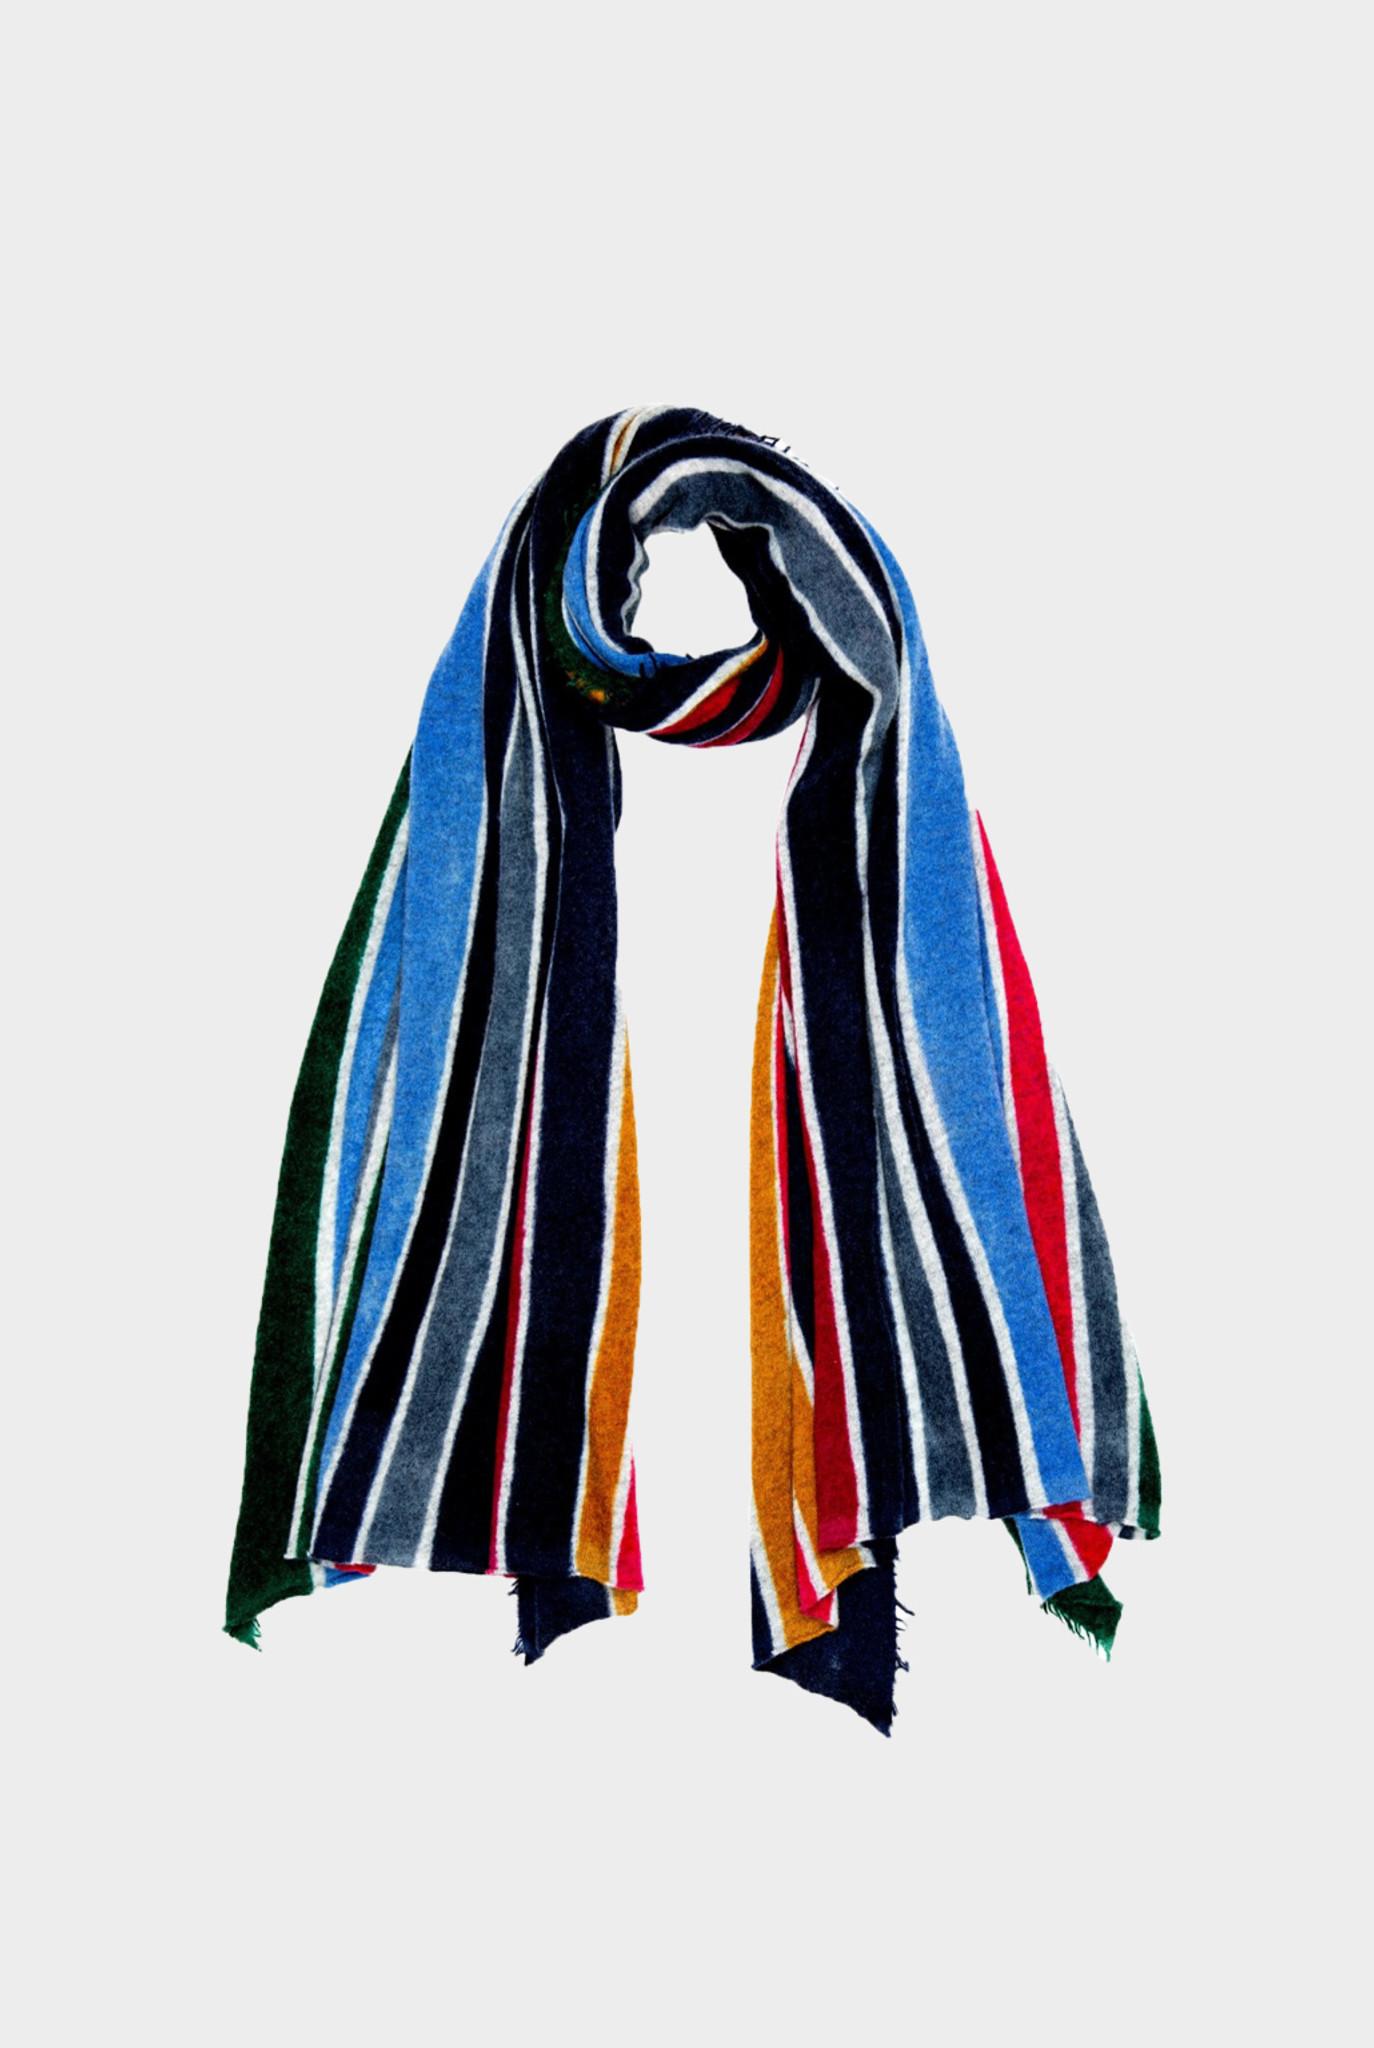 Flipper Scarf Multi Color Stripes Blue Red